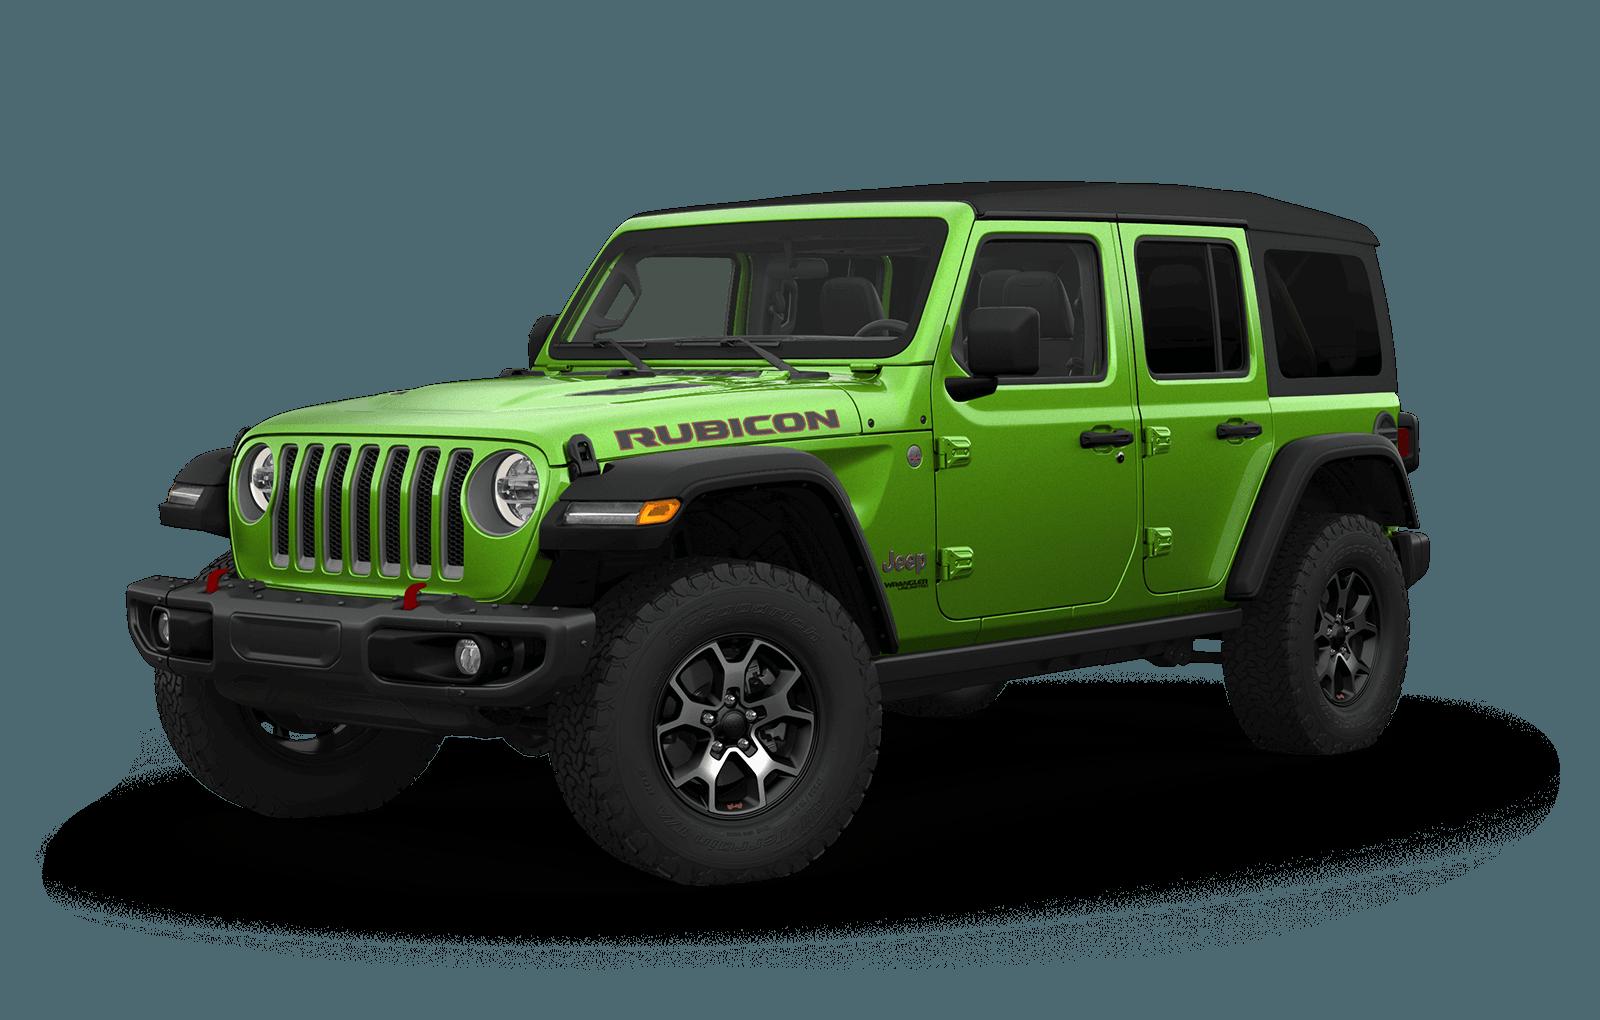 2019 Jeep Wrangler - Off Road 4x4 Vehicle   Jeep Canada